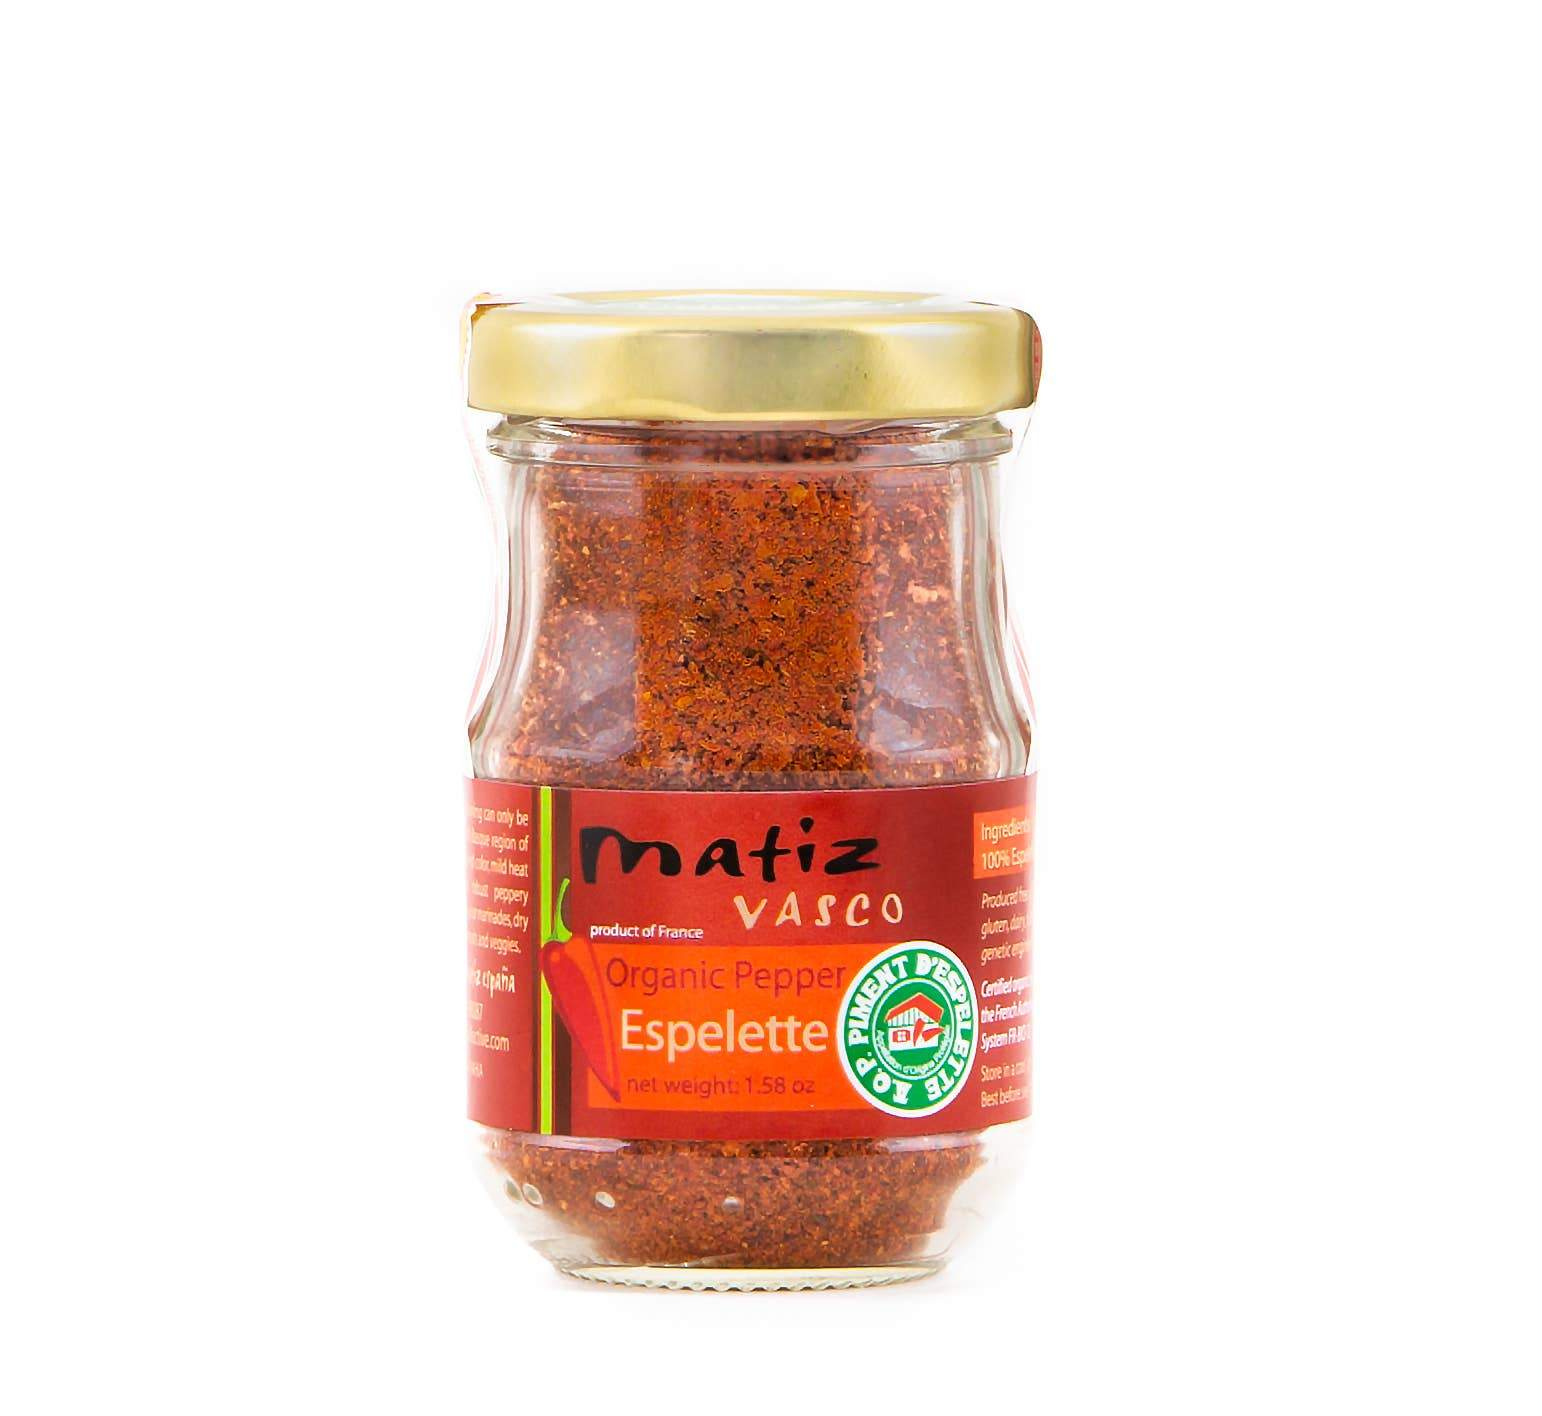 Matiz Piment d' Espelette - 1.6oz